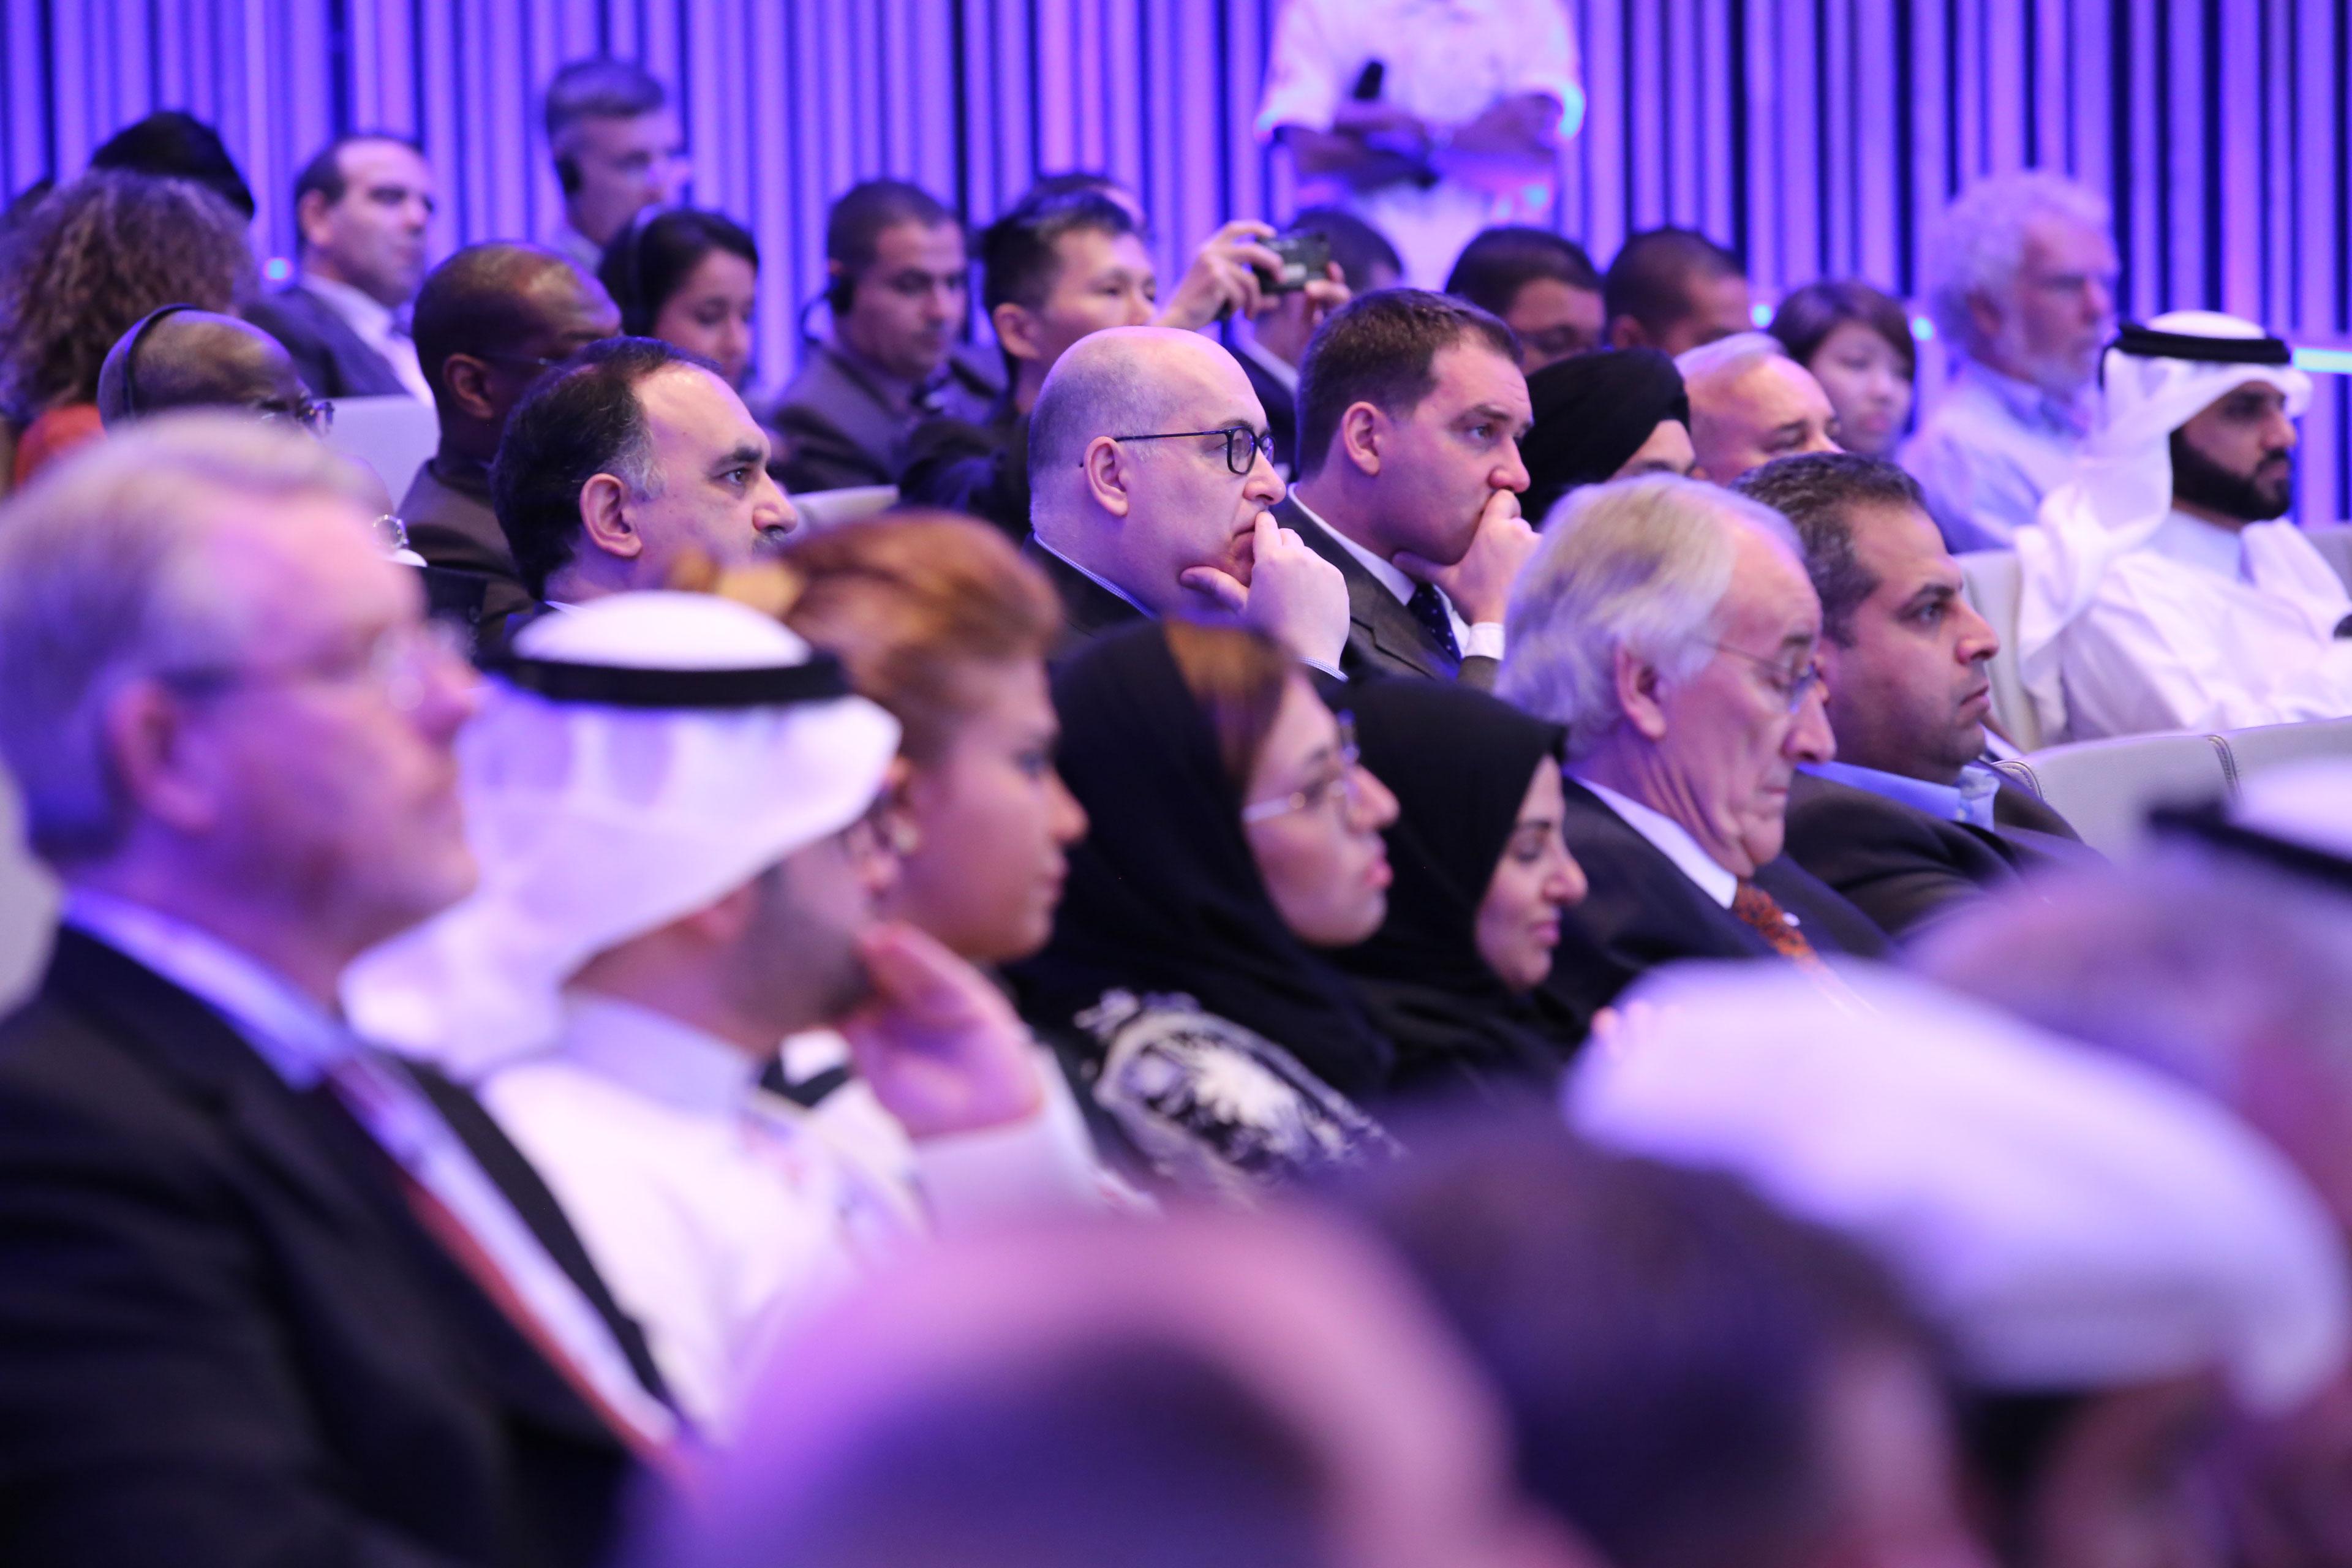 Accelerating Innovation at ITU Telecom World 2015